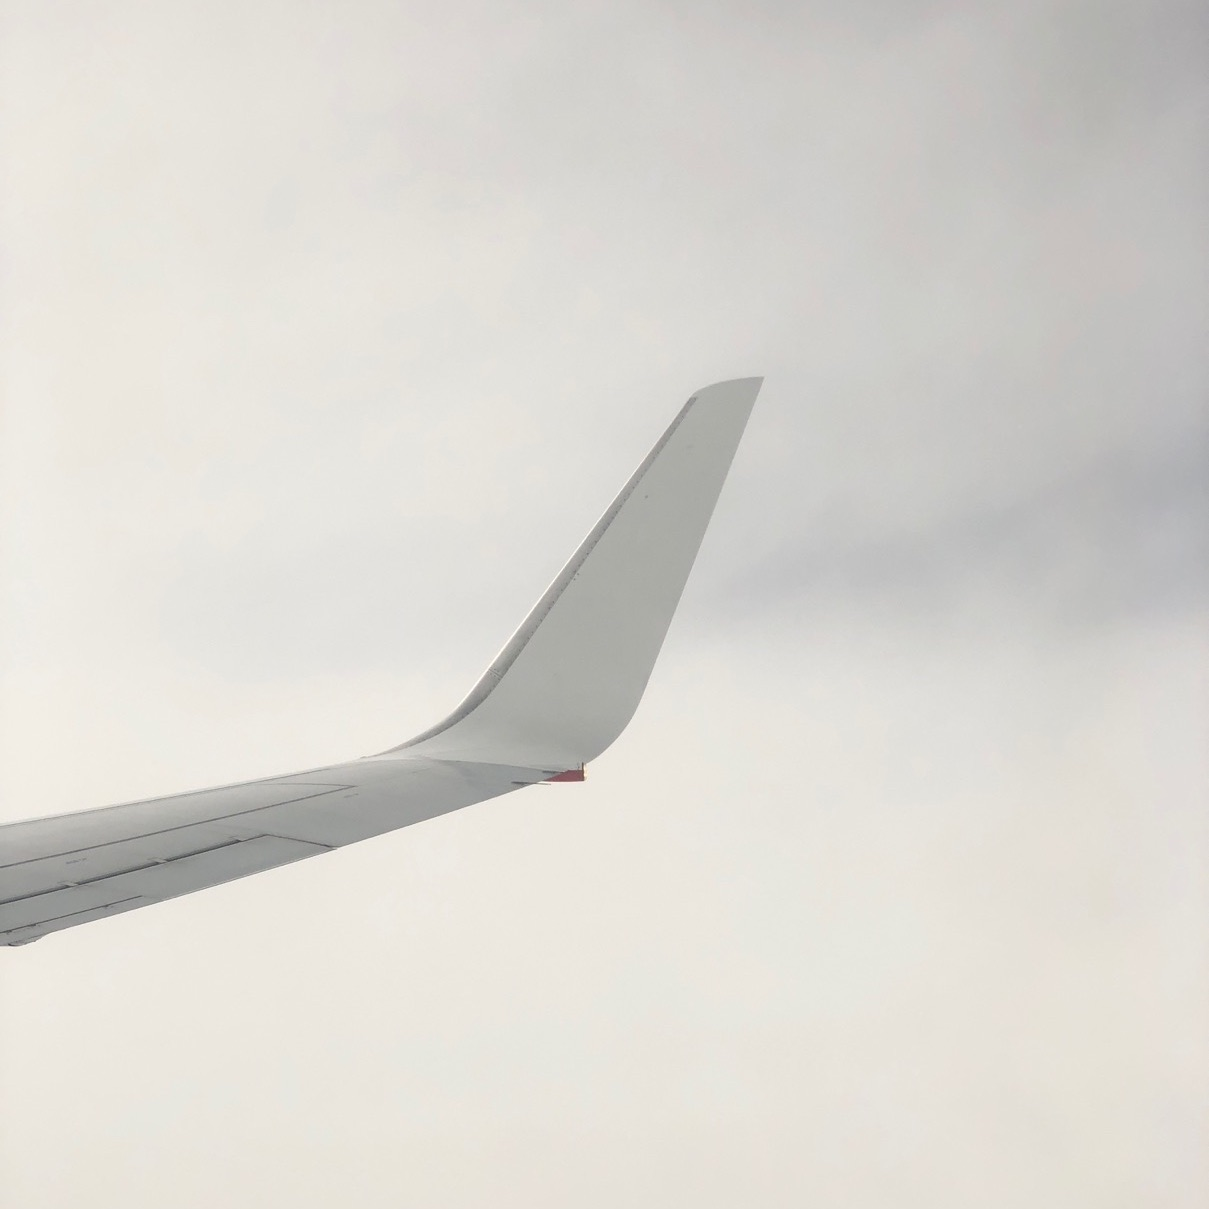 plane-wing-5.jpg